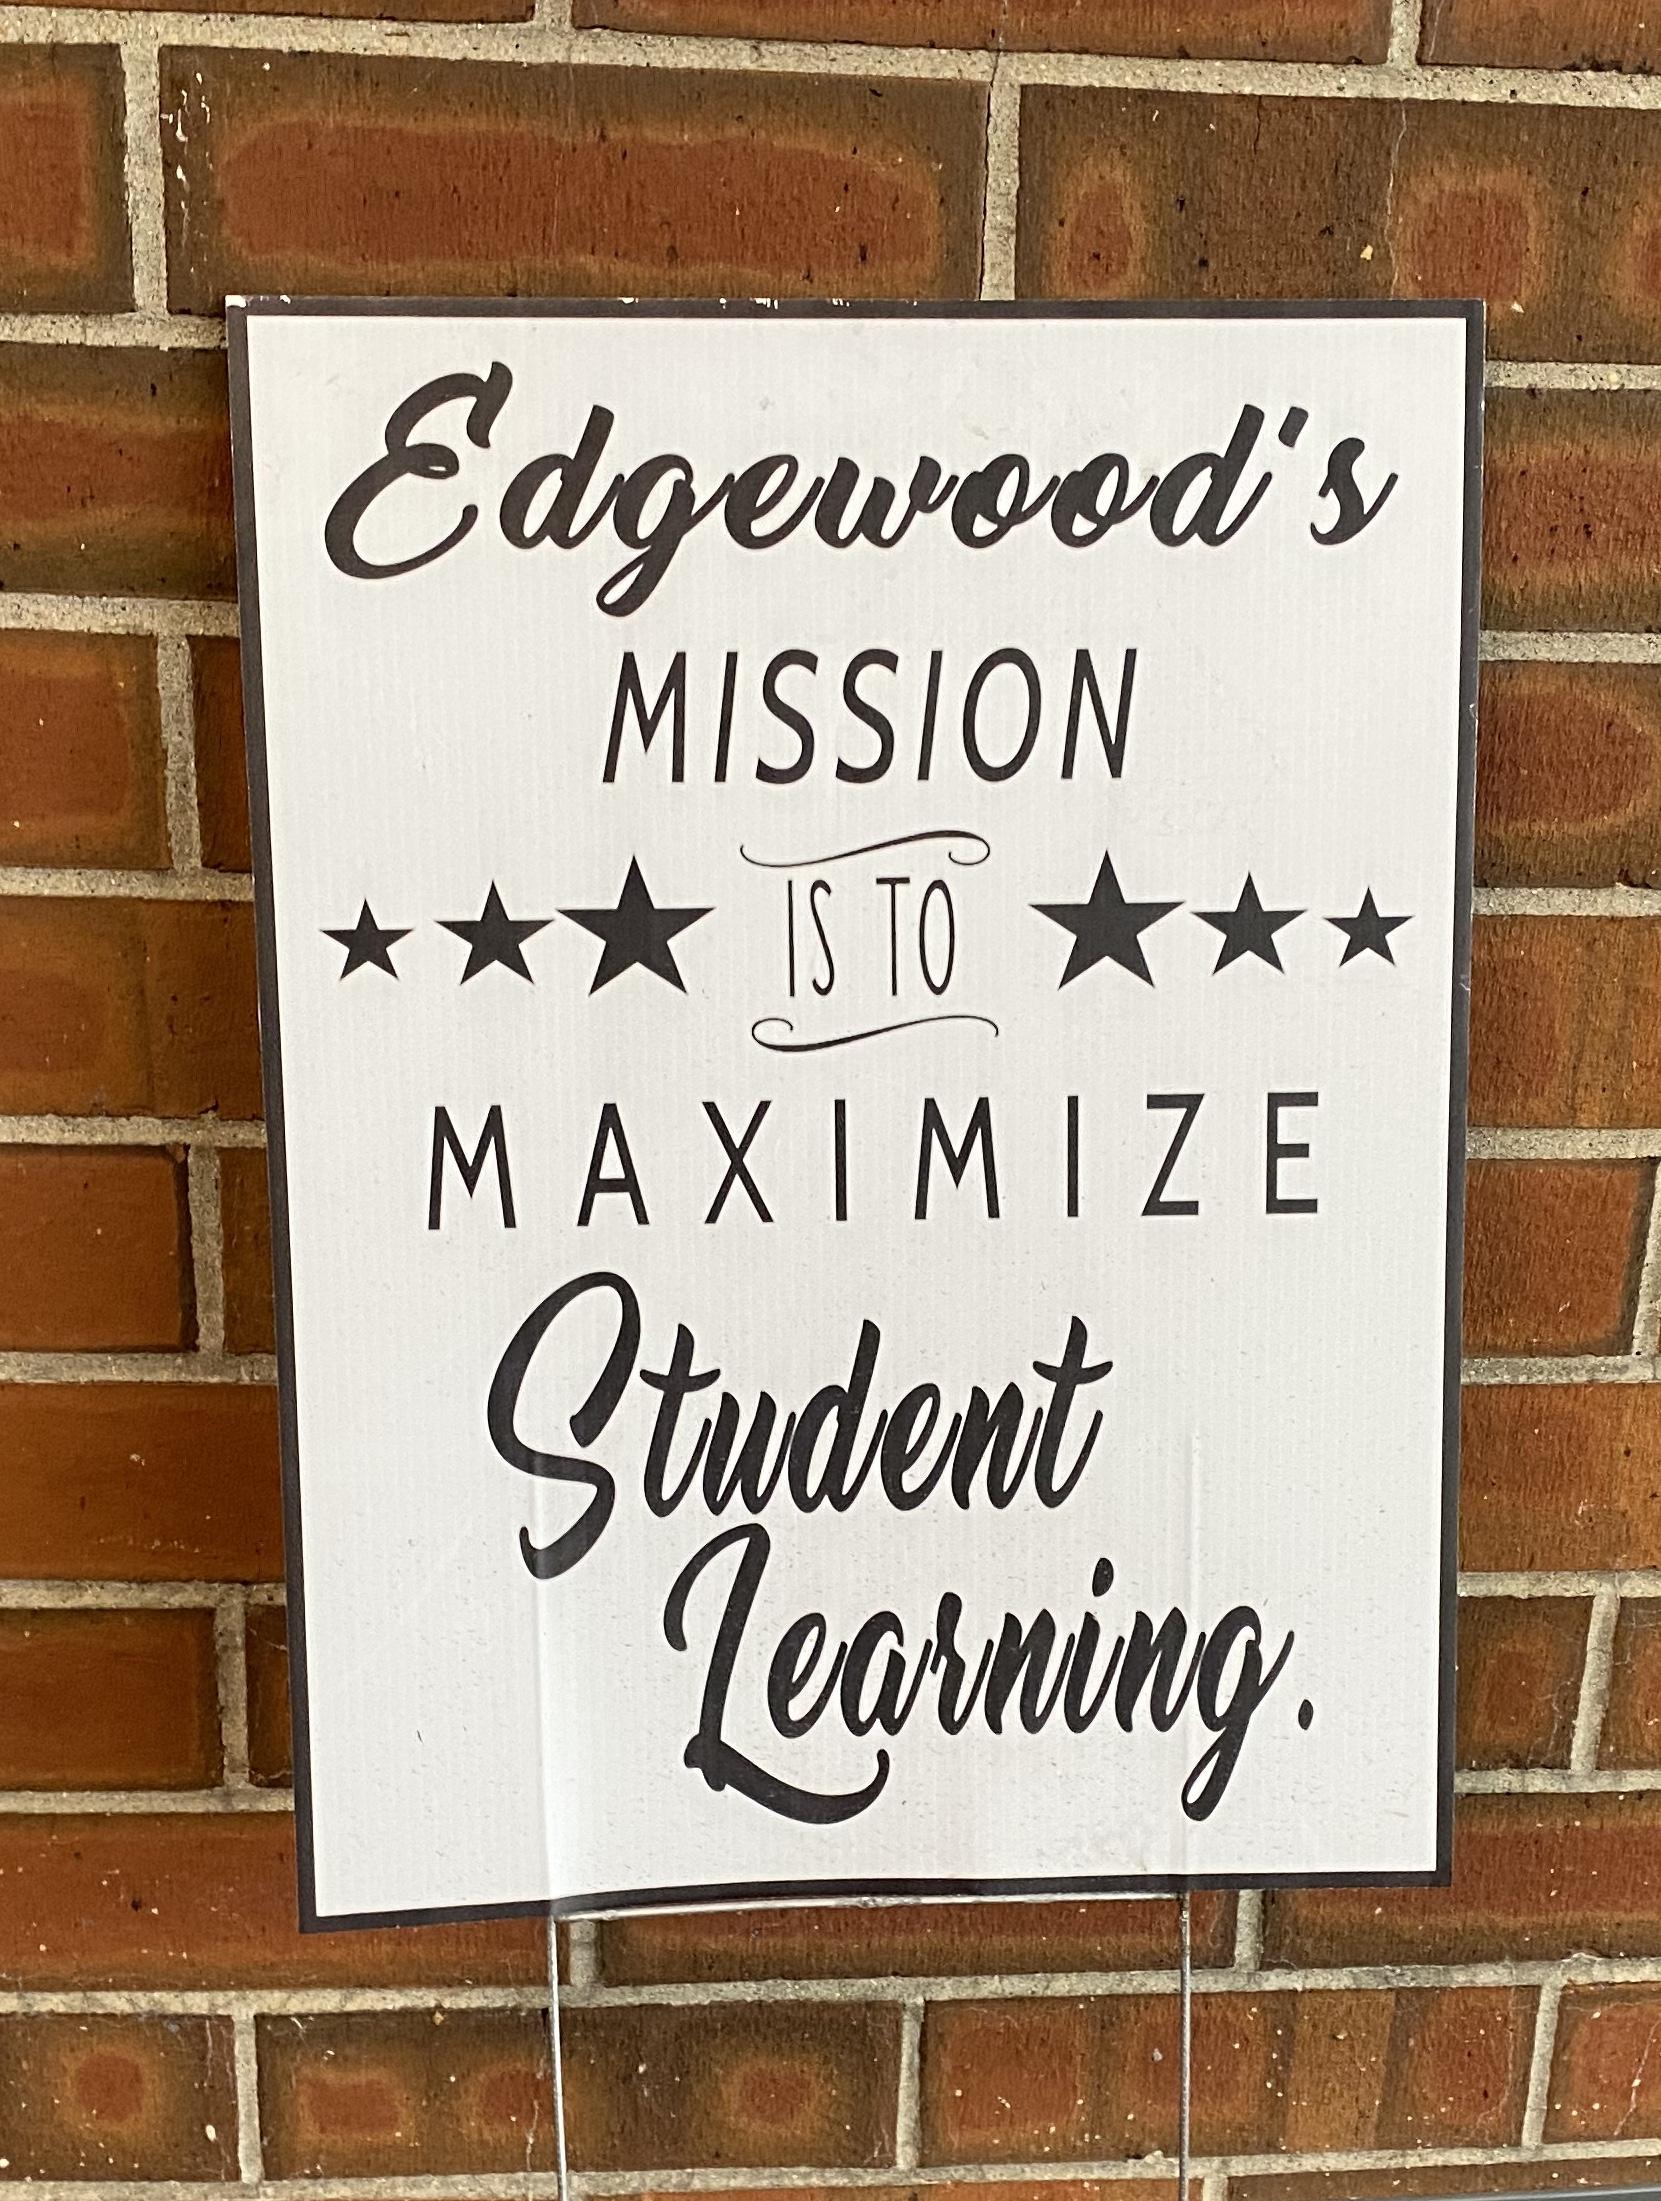 eLearning at Edgewood